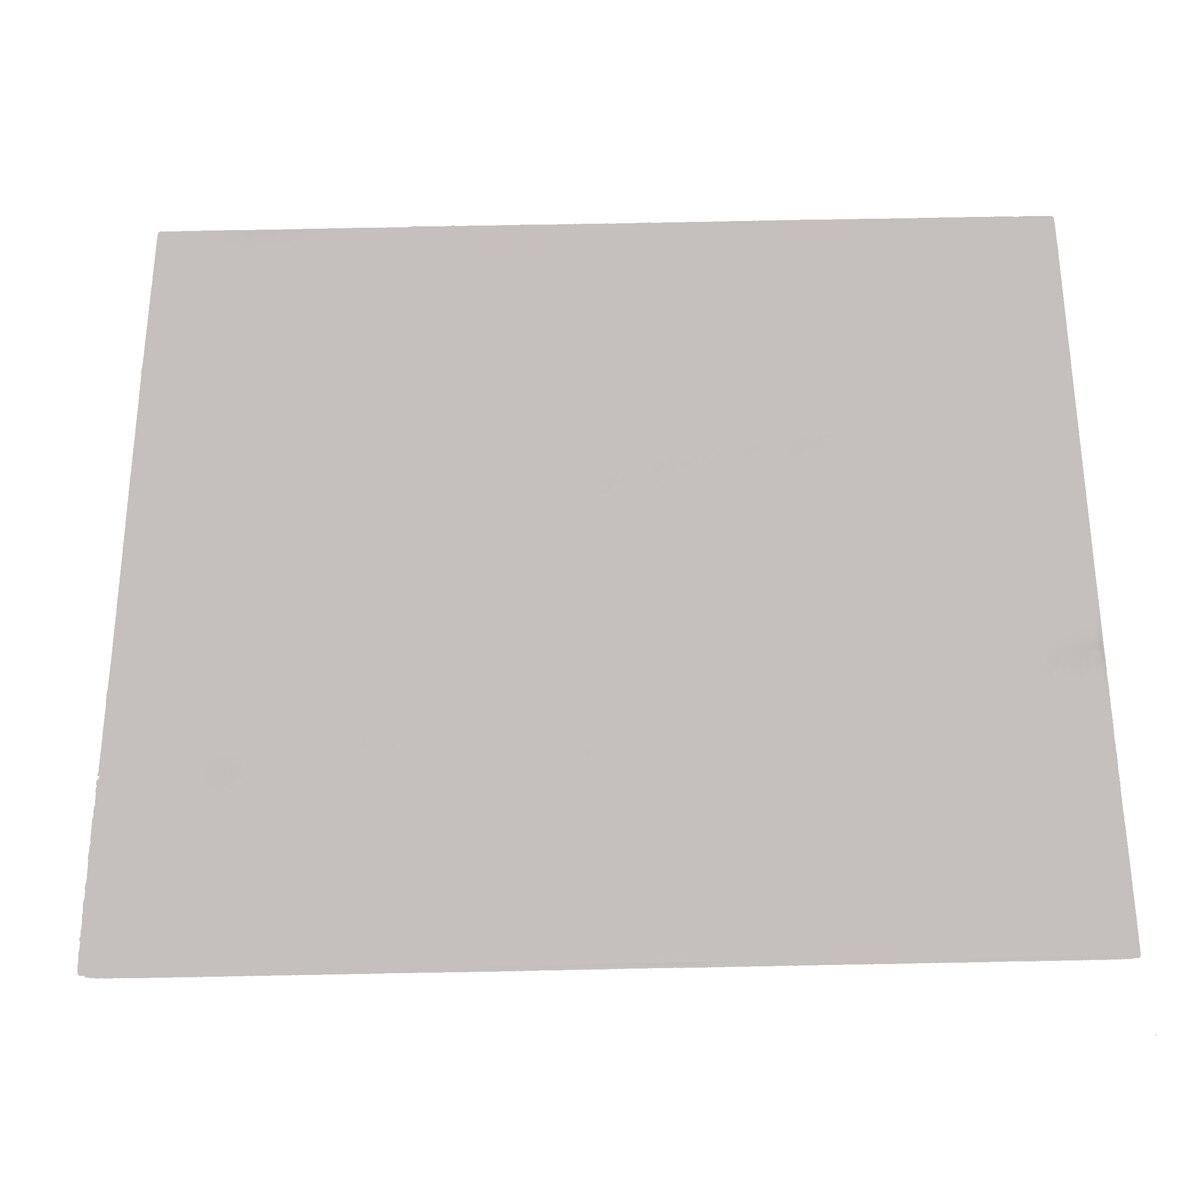 1pc Thin Titanium Metal Plate TC4/GR5 ASTM B54 Ti Sheet Foil With Corrosion Resistance 0.5mmx100mmx100mm